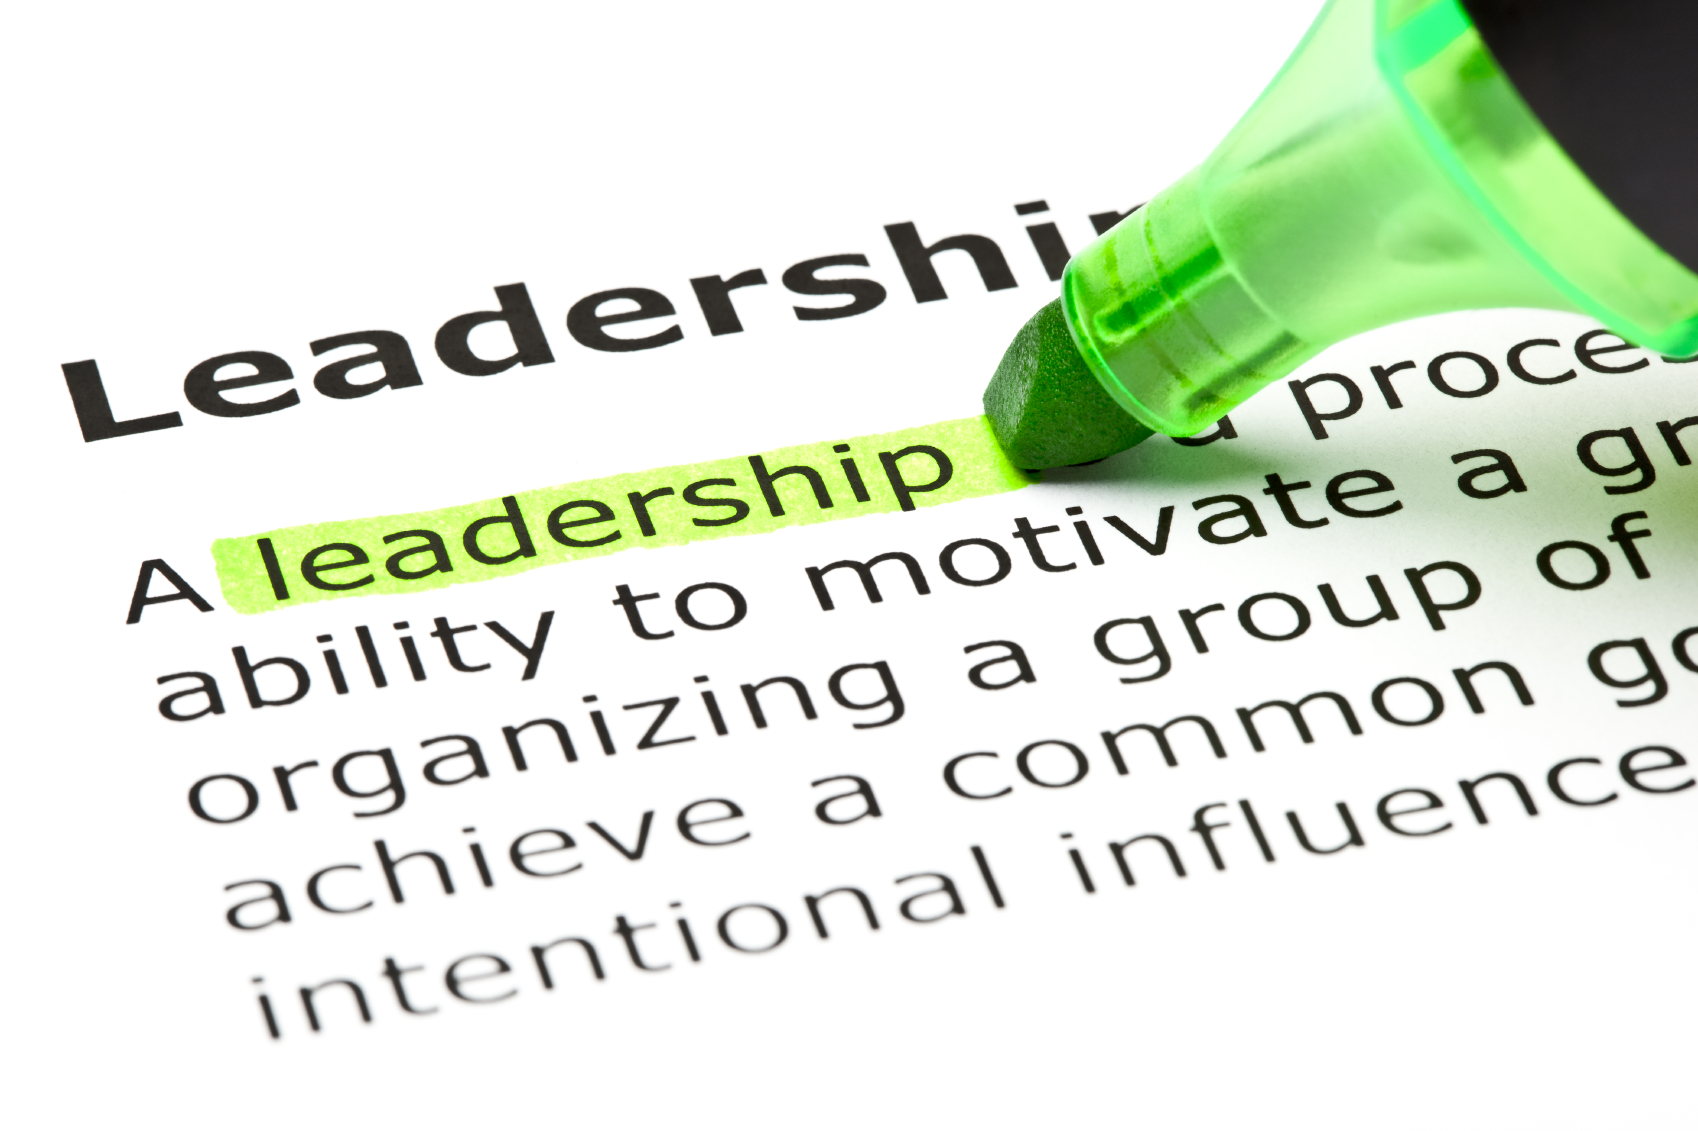 ifap common good 11 attention student leaders leadership development workshop